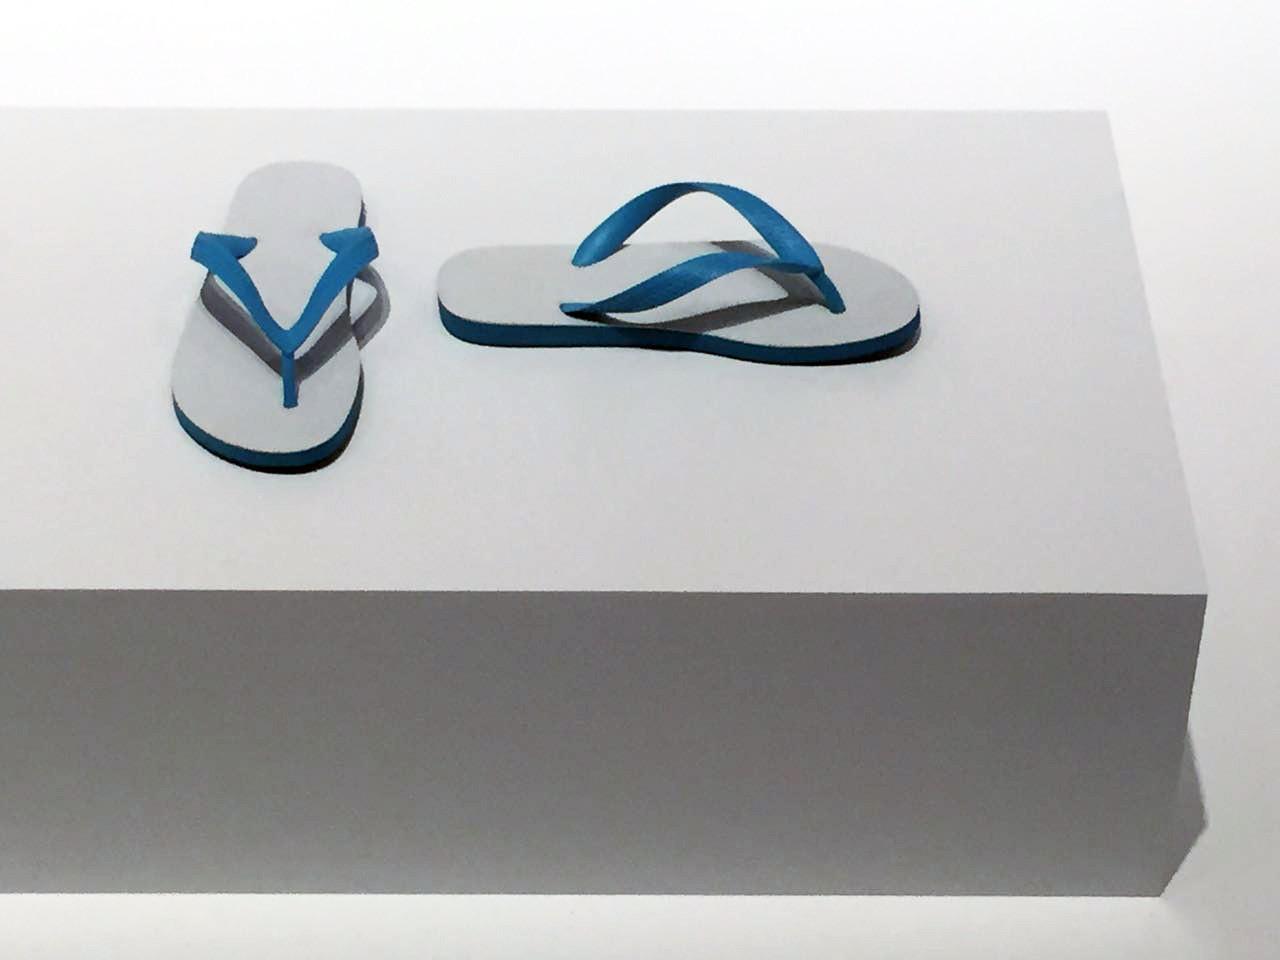 moma-exposicao-fashion-6 (Foto: Acervo pessoal)